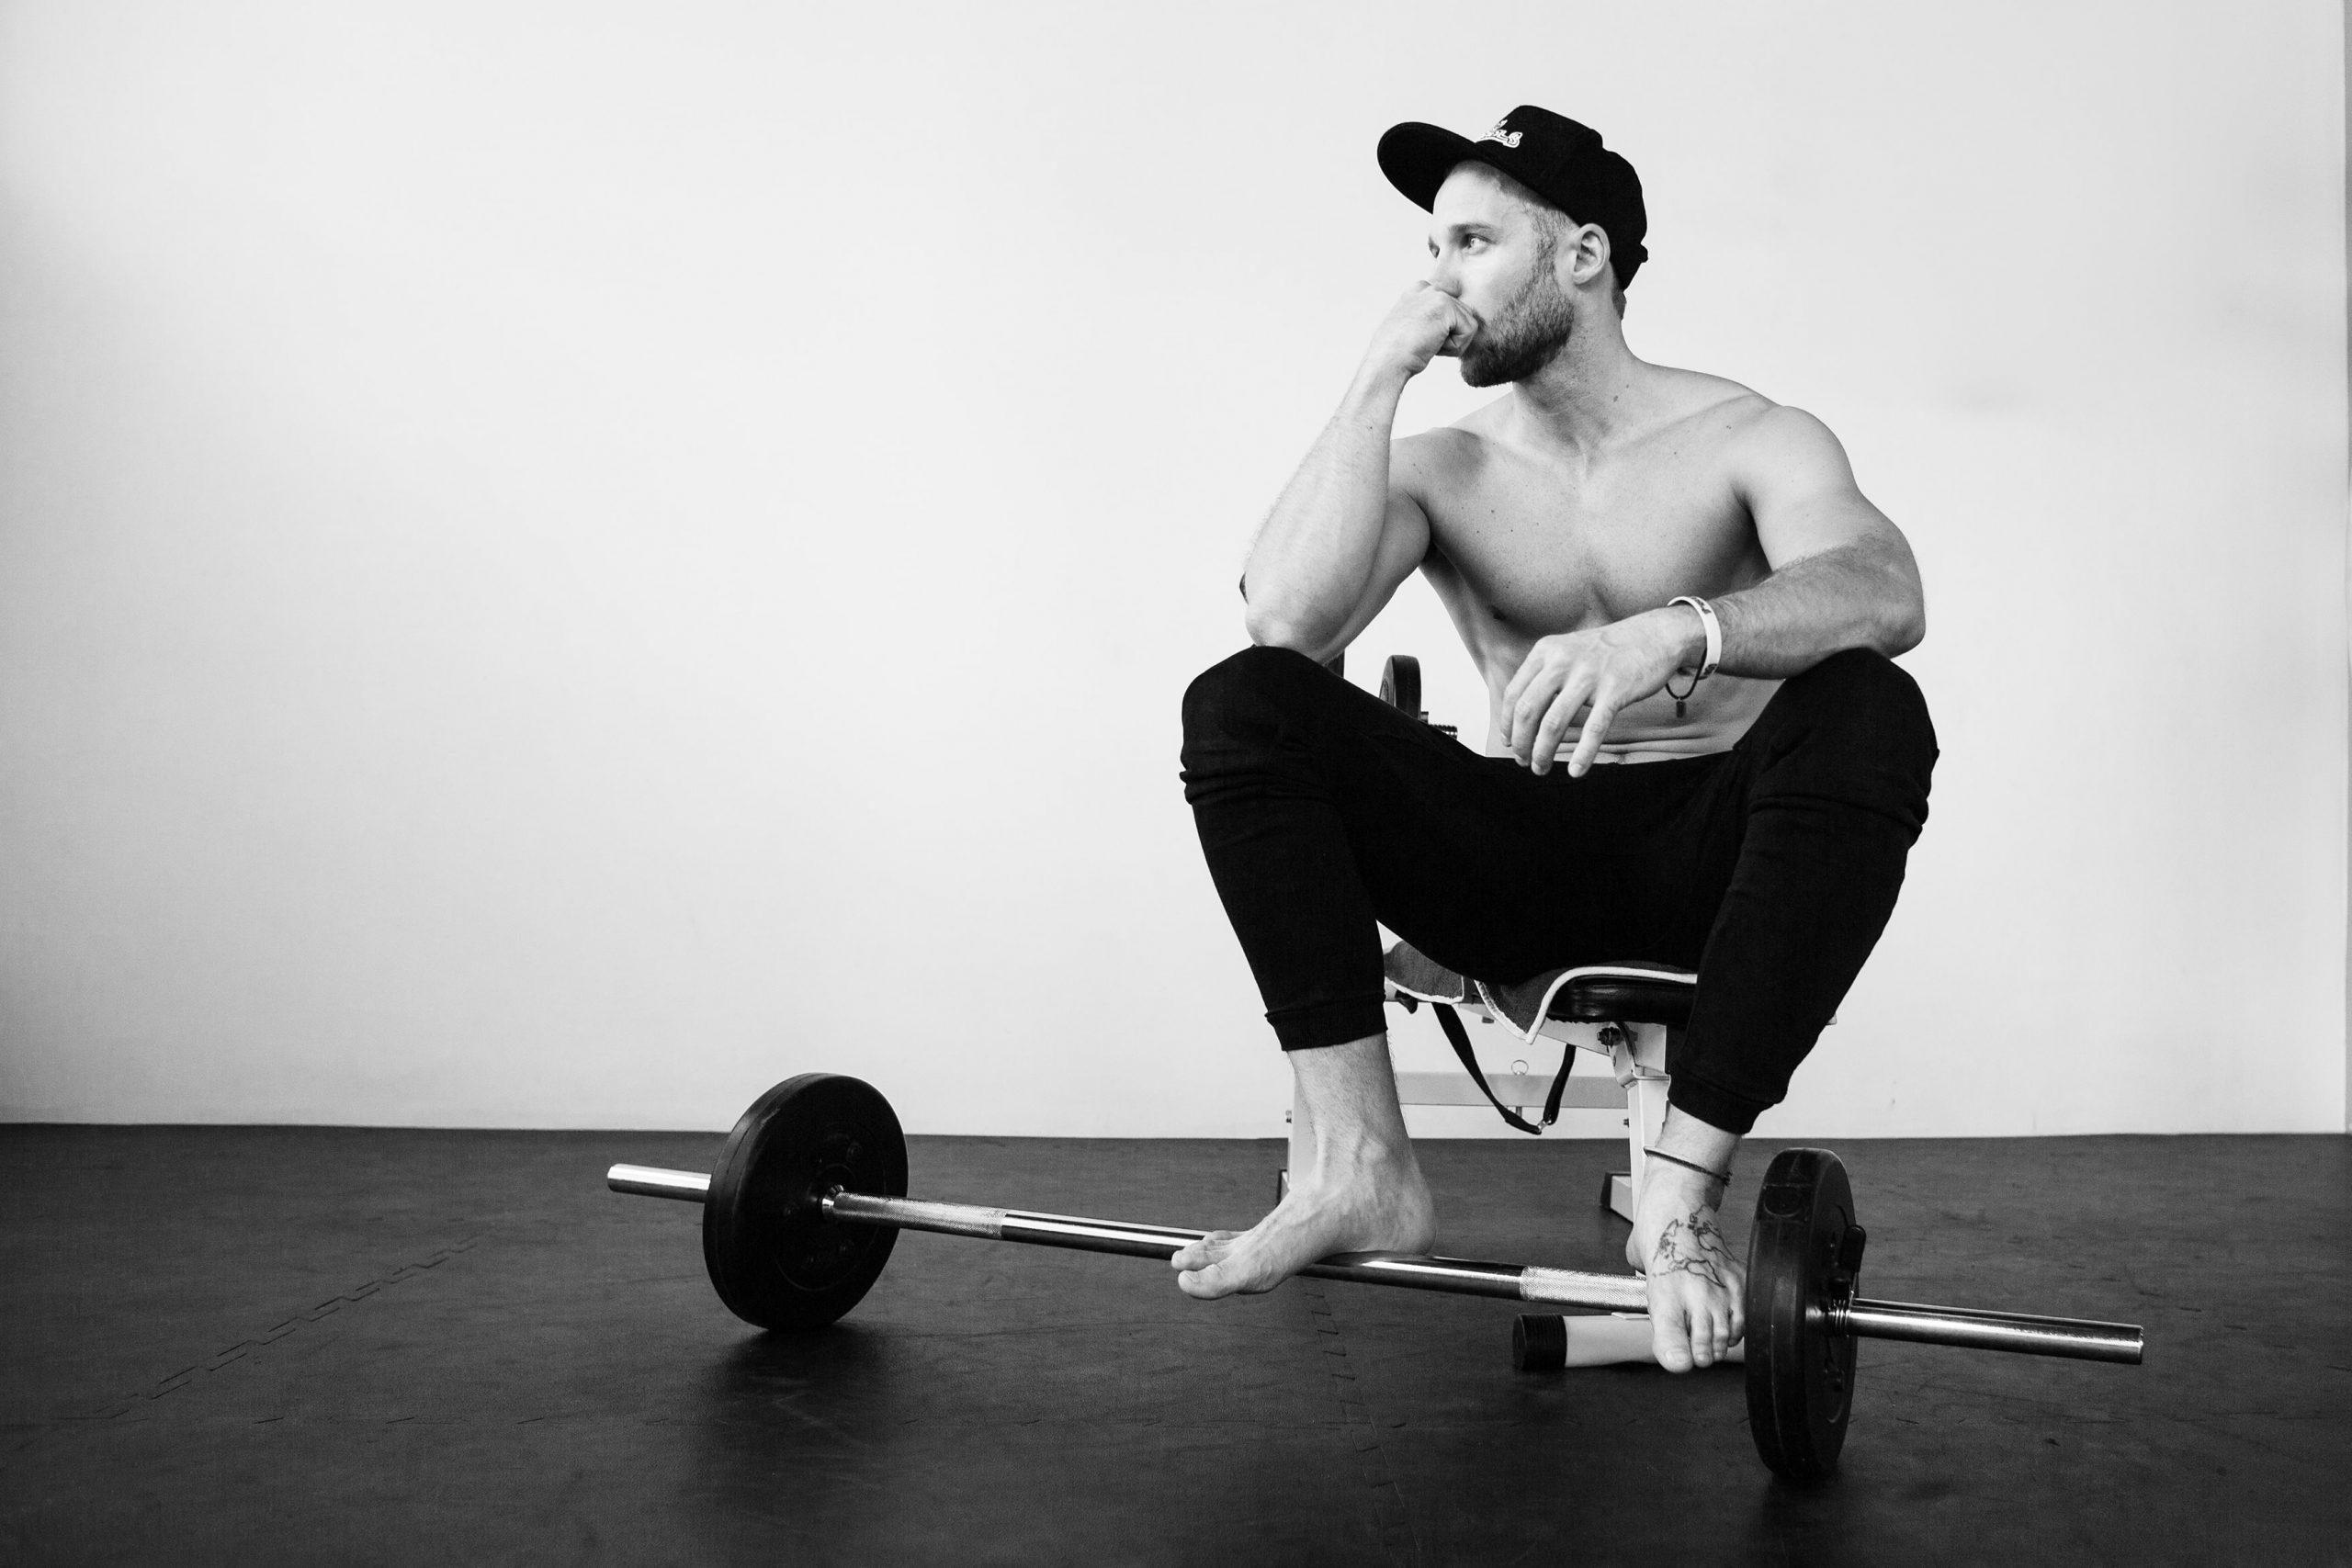 business stories fitness_lifestyle_mike pose_FabulouSky_Studio Photography_Christina Hein